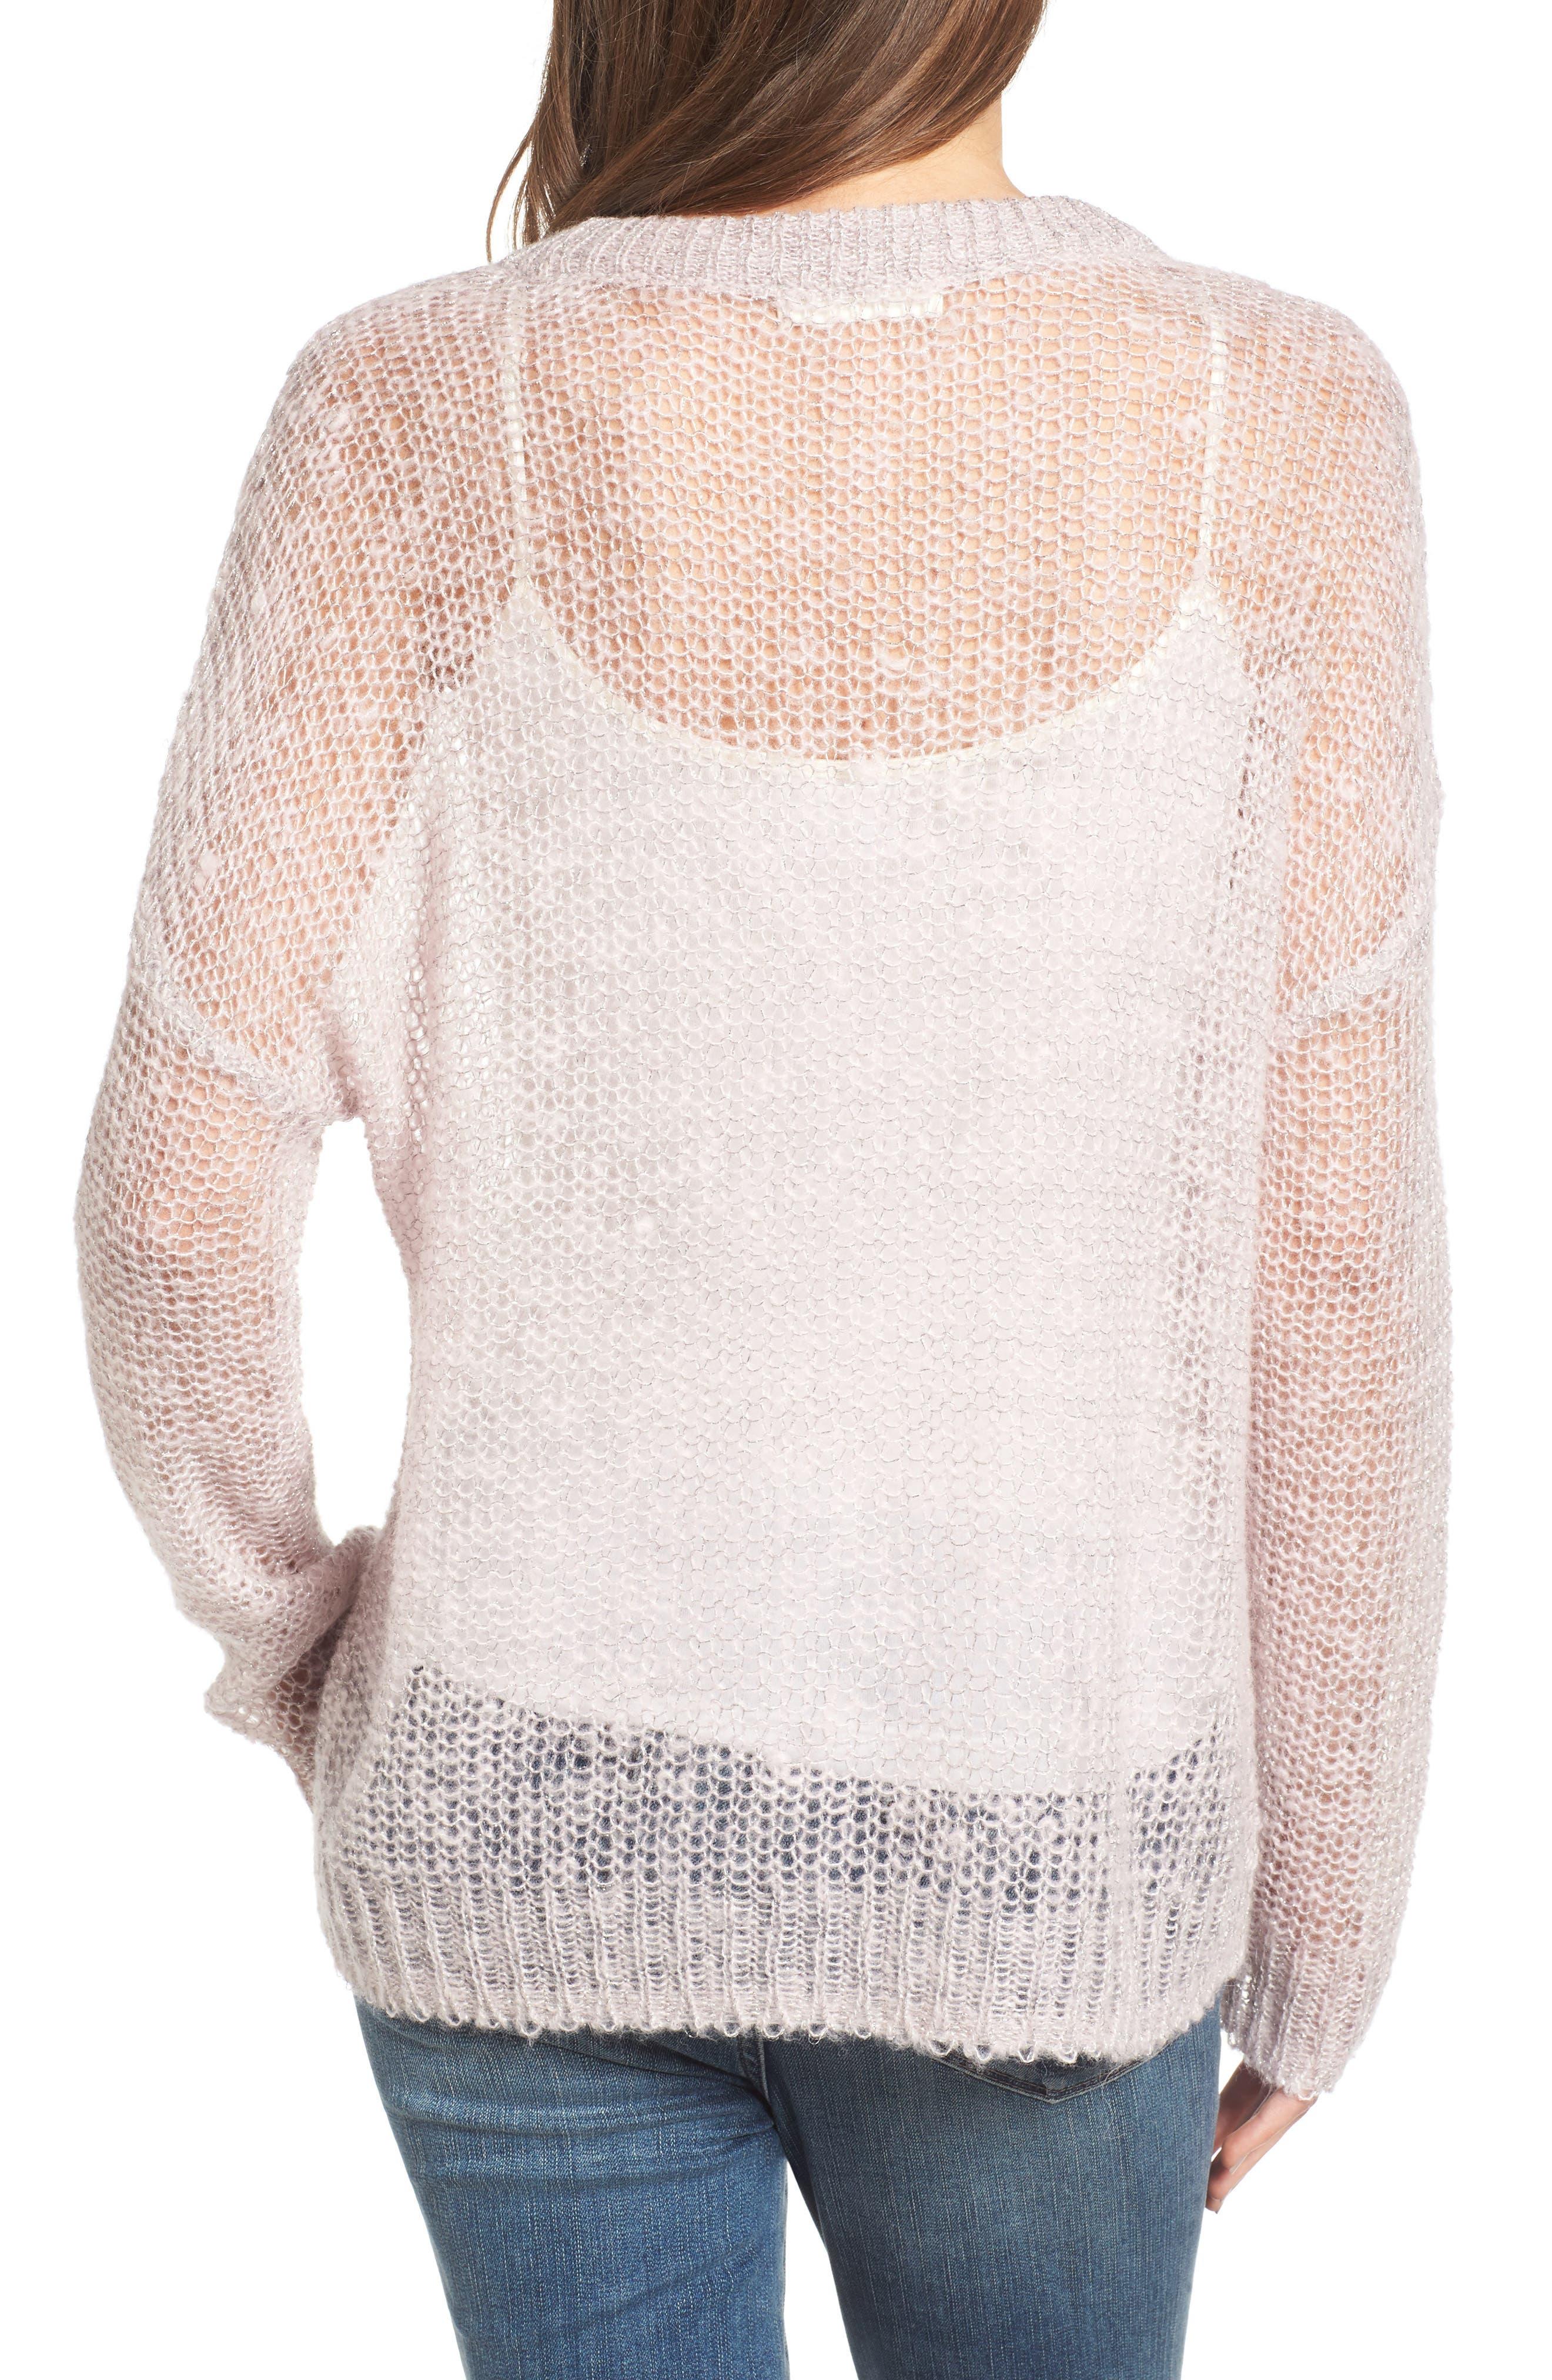 Alternate Image 2  - Treasure & Bond x Something Navy Sheer Metallic Sweater